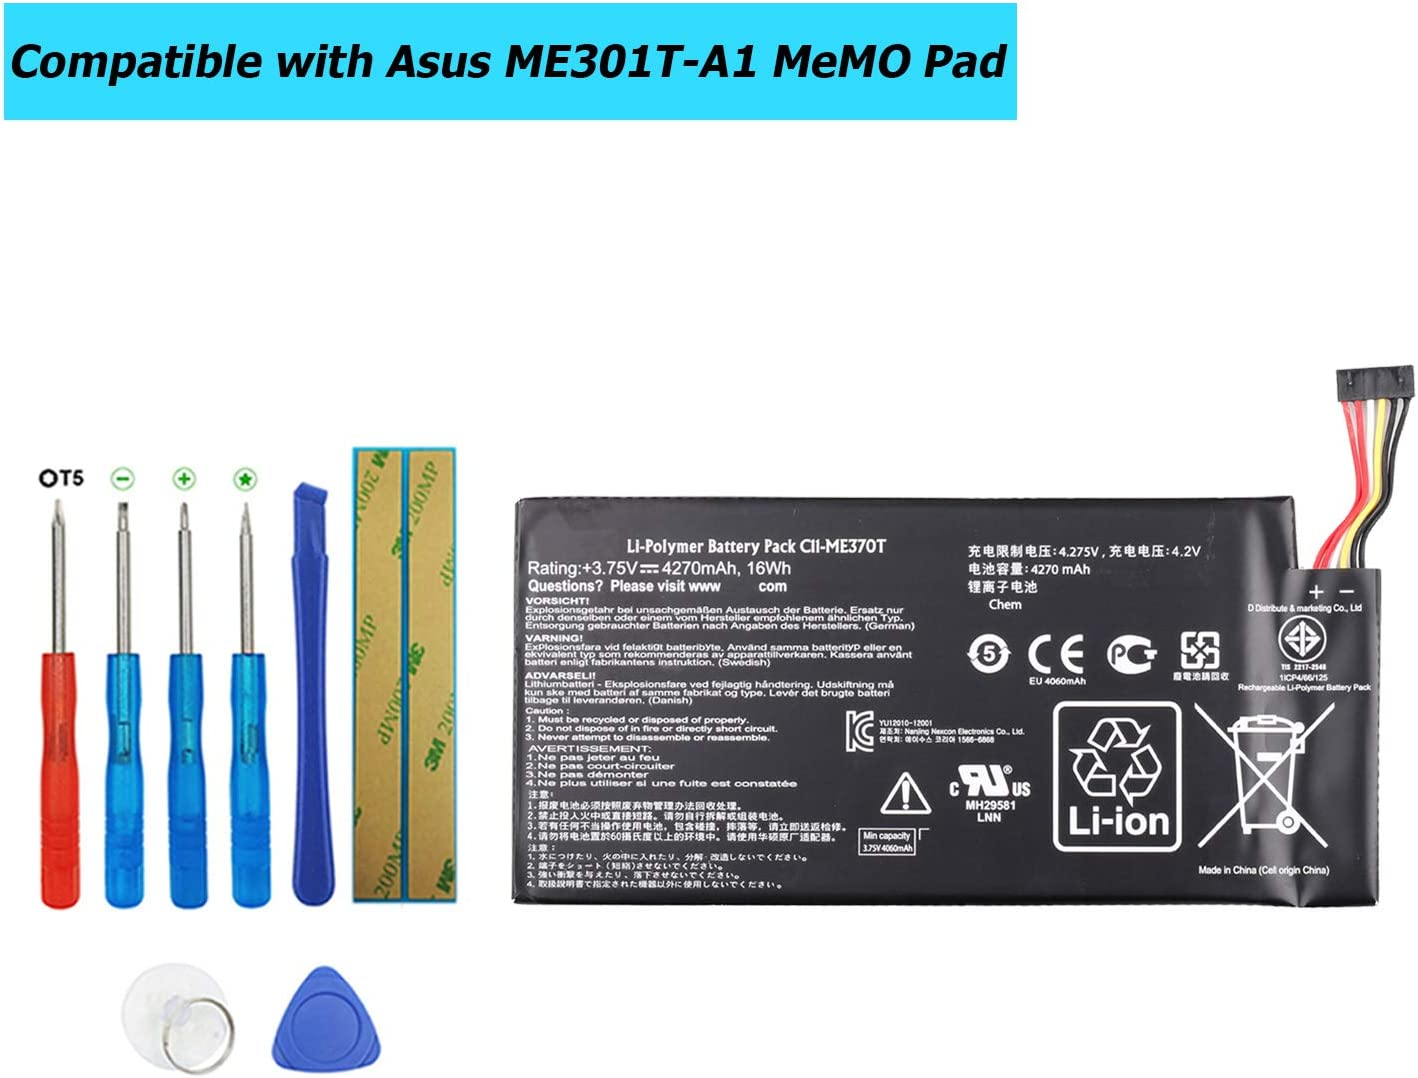 Bateria Para Asus Me301t-a1 Me370t Google Nexus 7 (2012)